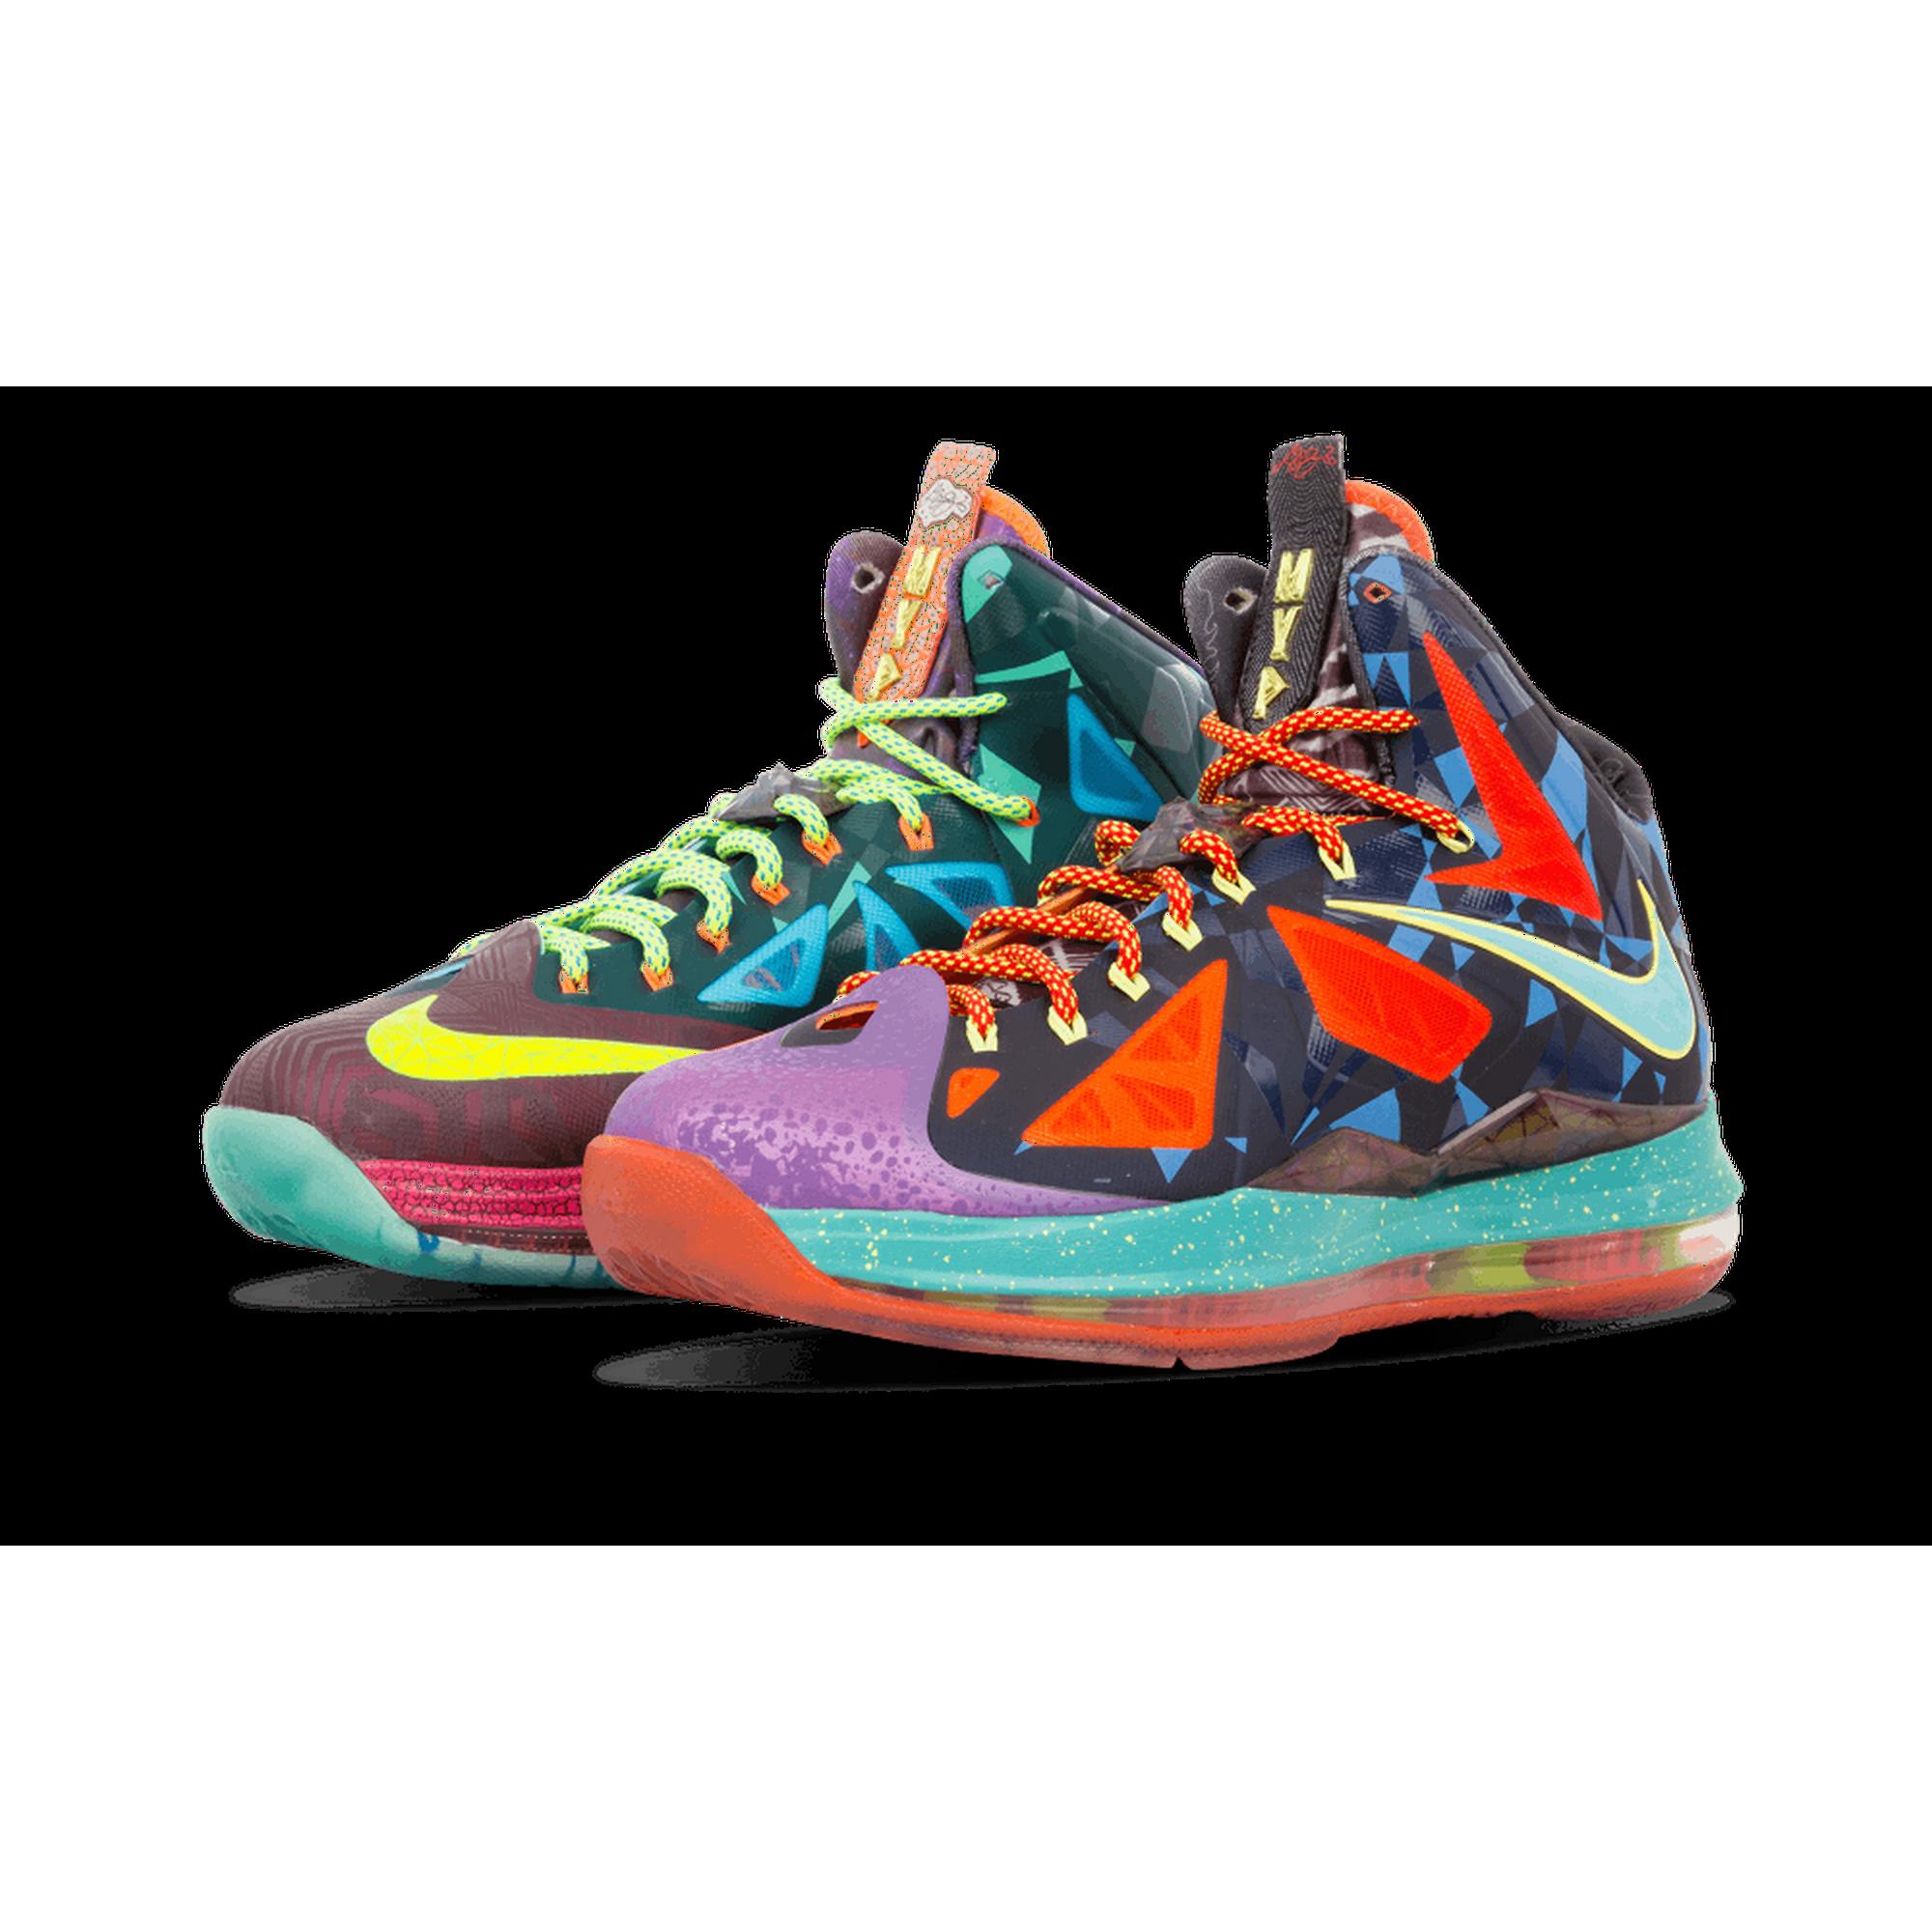 ceee13adc87 Nike - Men - Lebron 10 Premium  What The Mvp  - 618217-300 - Size 10 ...